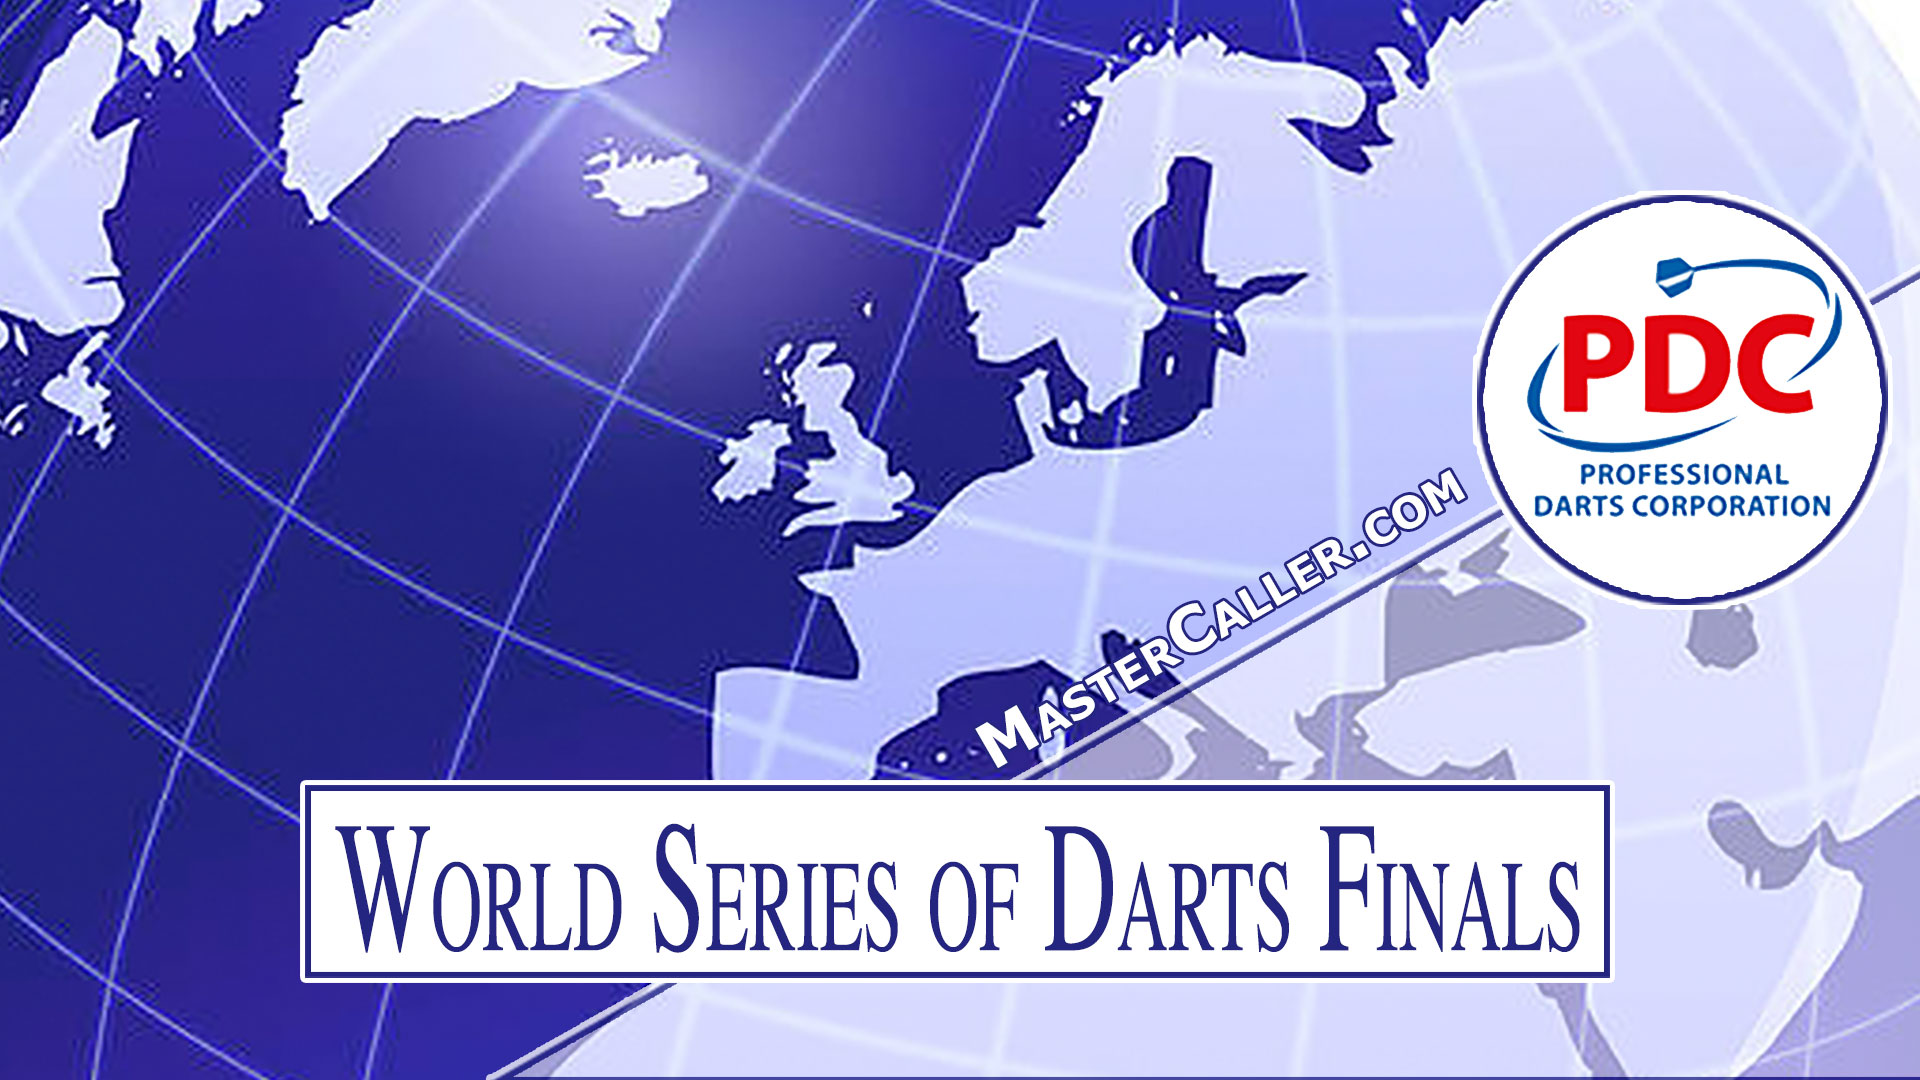 World Series of Darts Finals - 2022 Logo